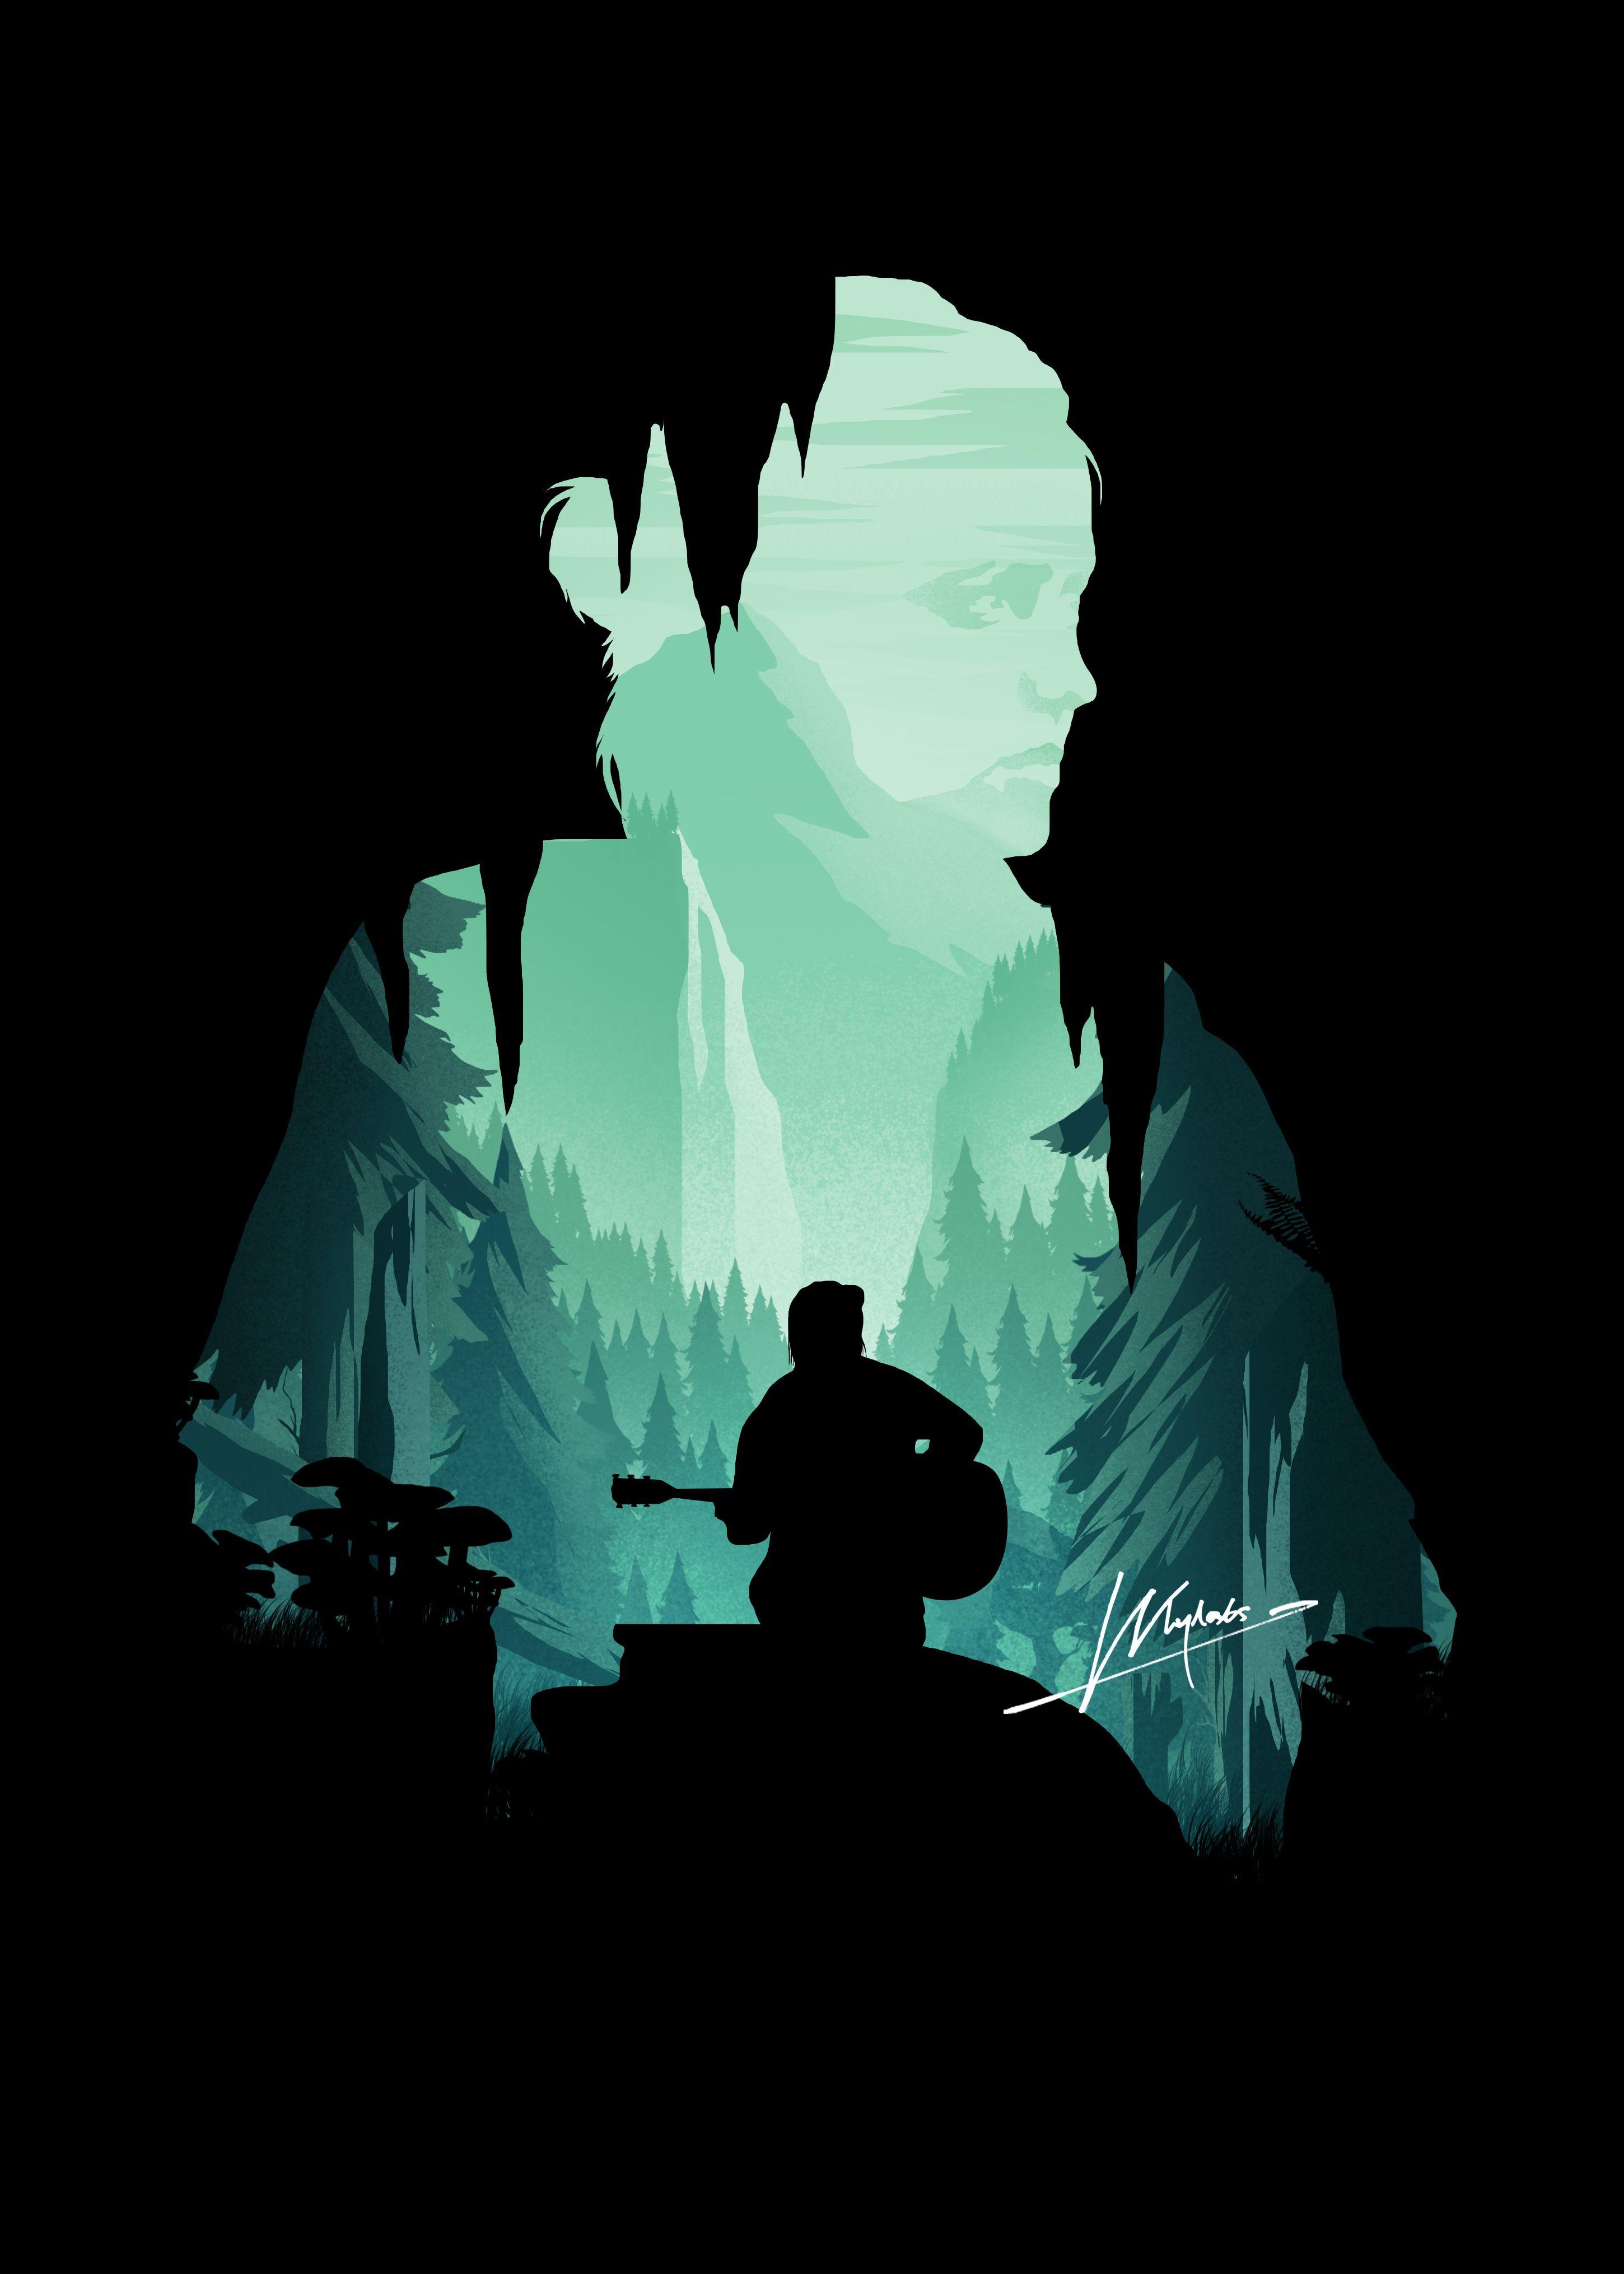 Ellie The Last Of Us 2 Minimalistic Poster Print Metal Posters